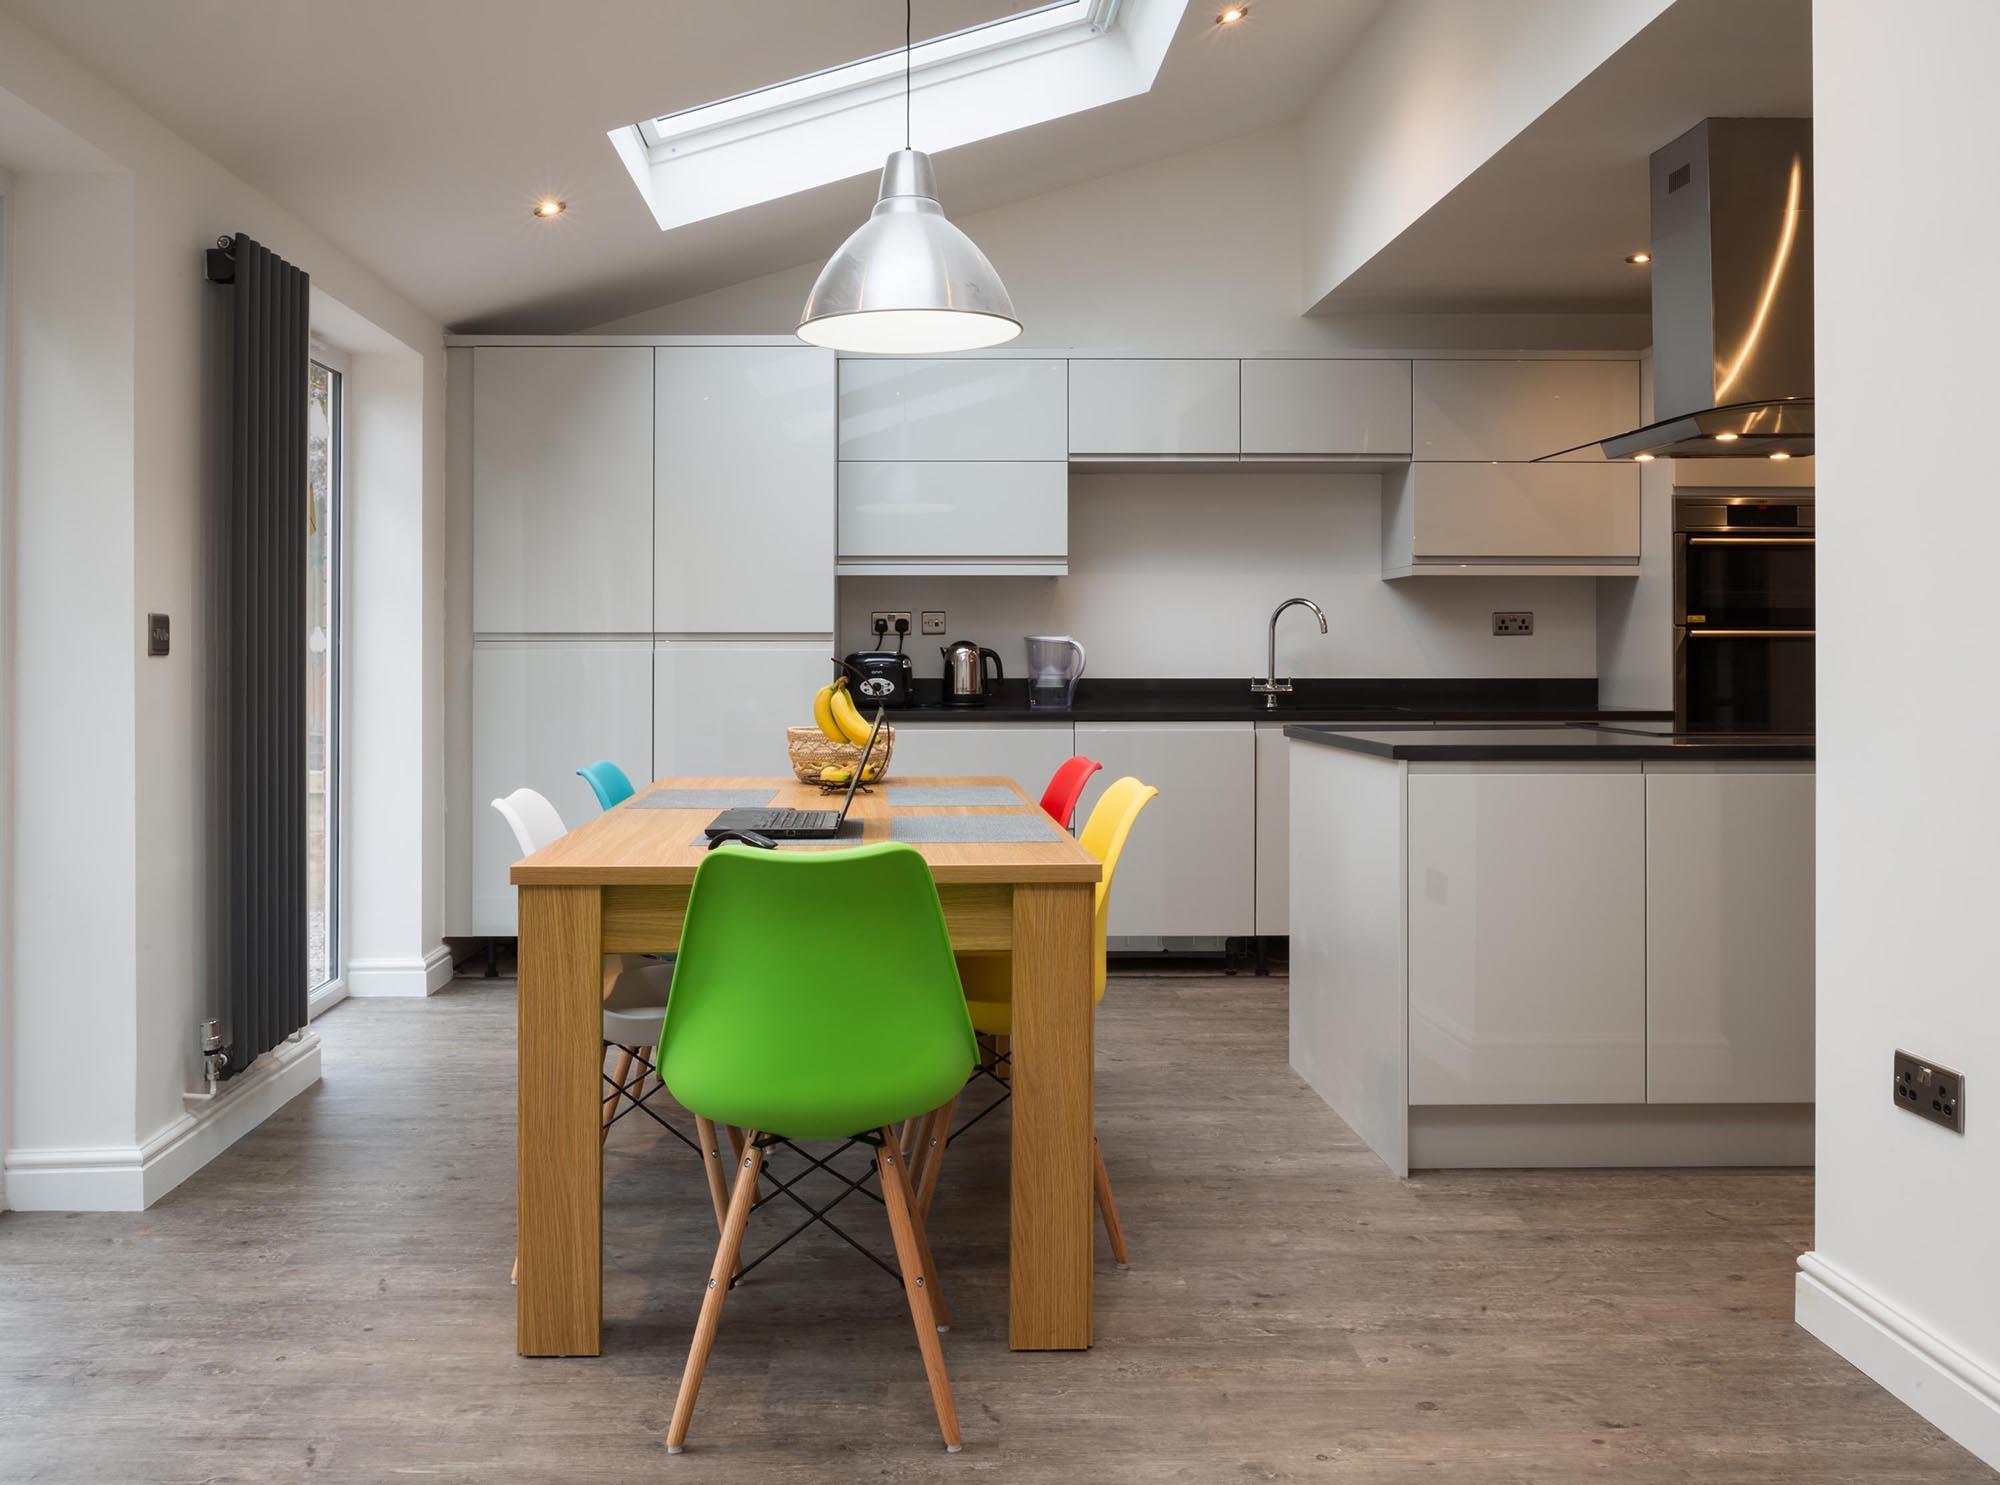 studio-severn-architects-shropshire-riba-uk-04